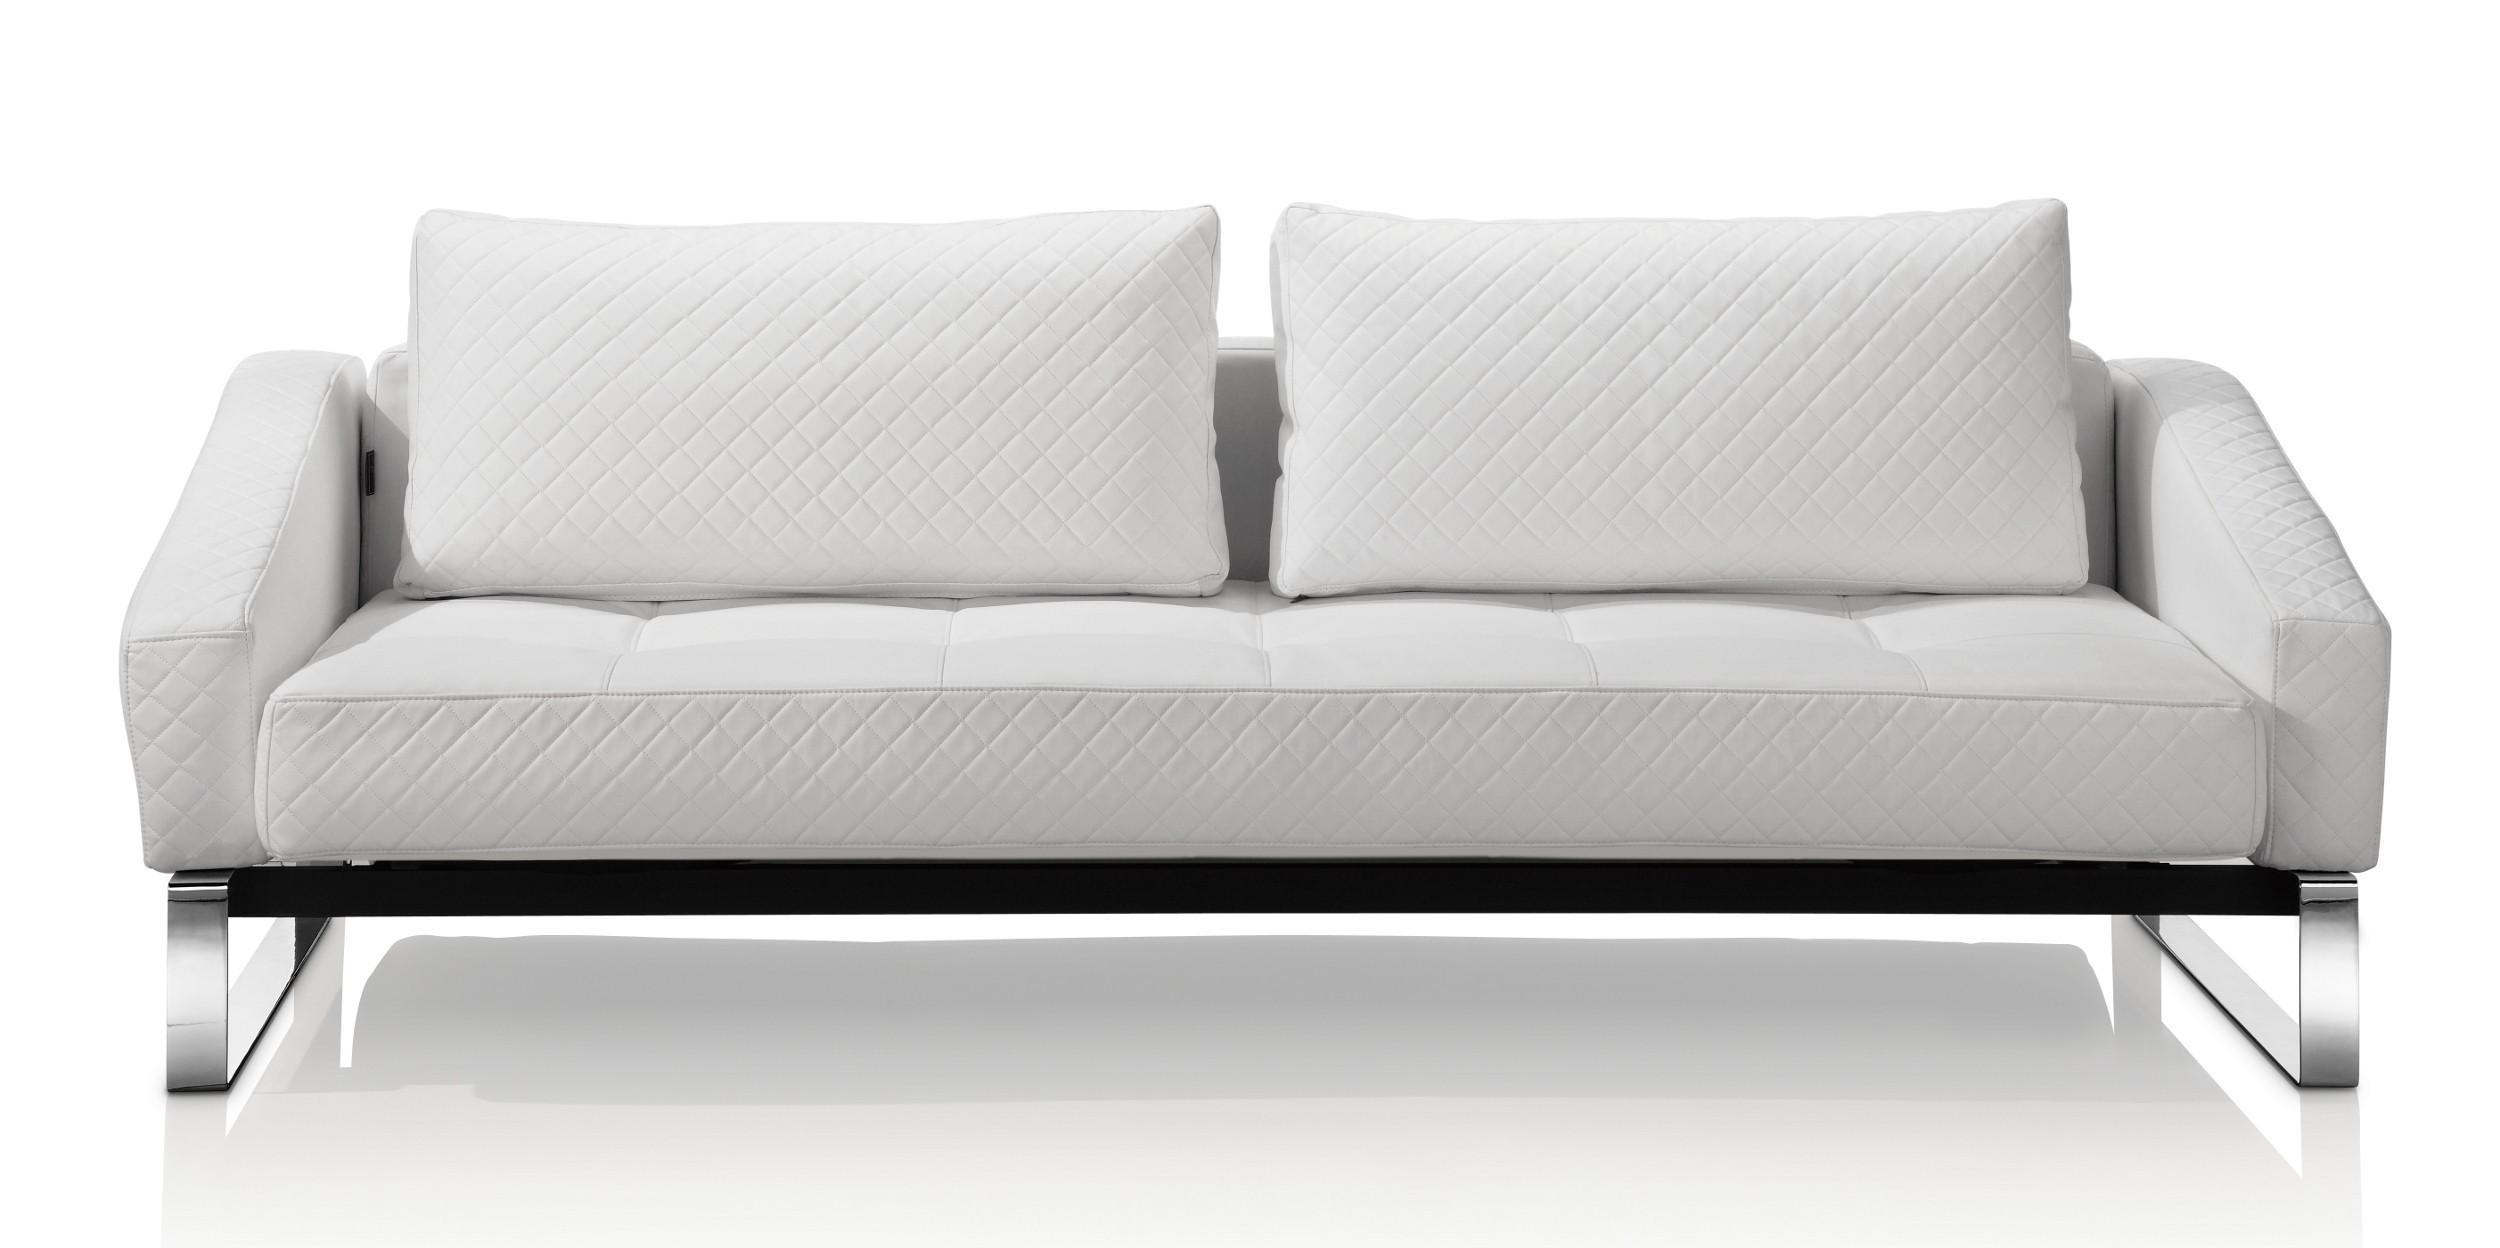 Sofas Center : Whiteper Sofas Sale Sofa In Dallas Fort Worth Pertaining To Dallas Sleeper Sofas (Image 20 of 20)